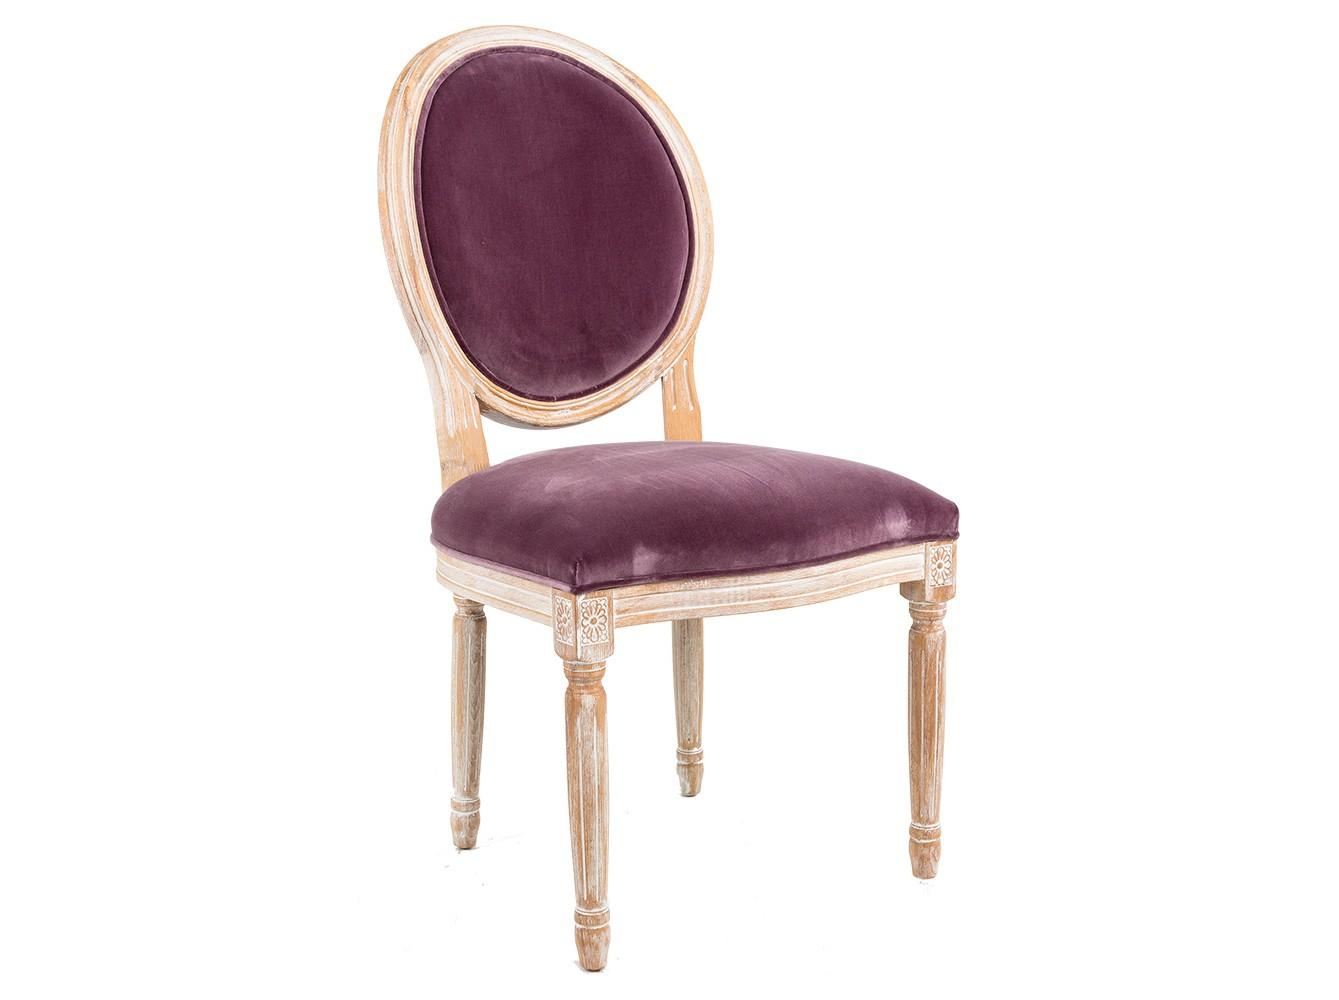 Кухонный стул Object Desire 15440771 от thefurnish